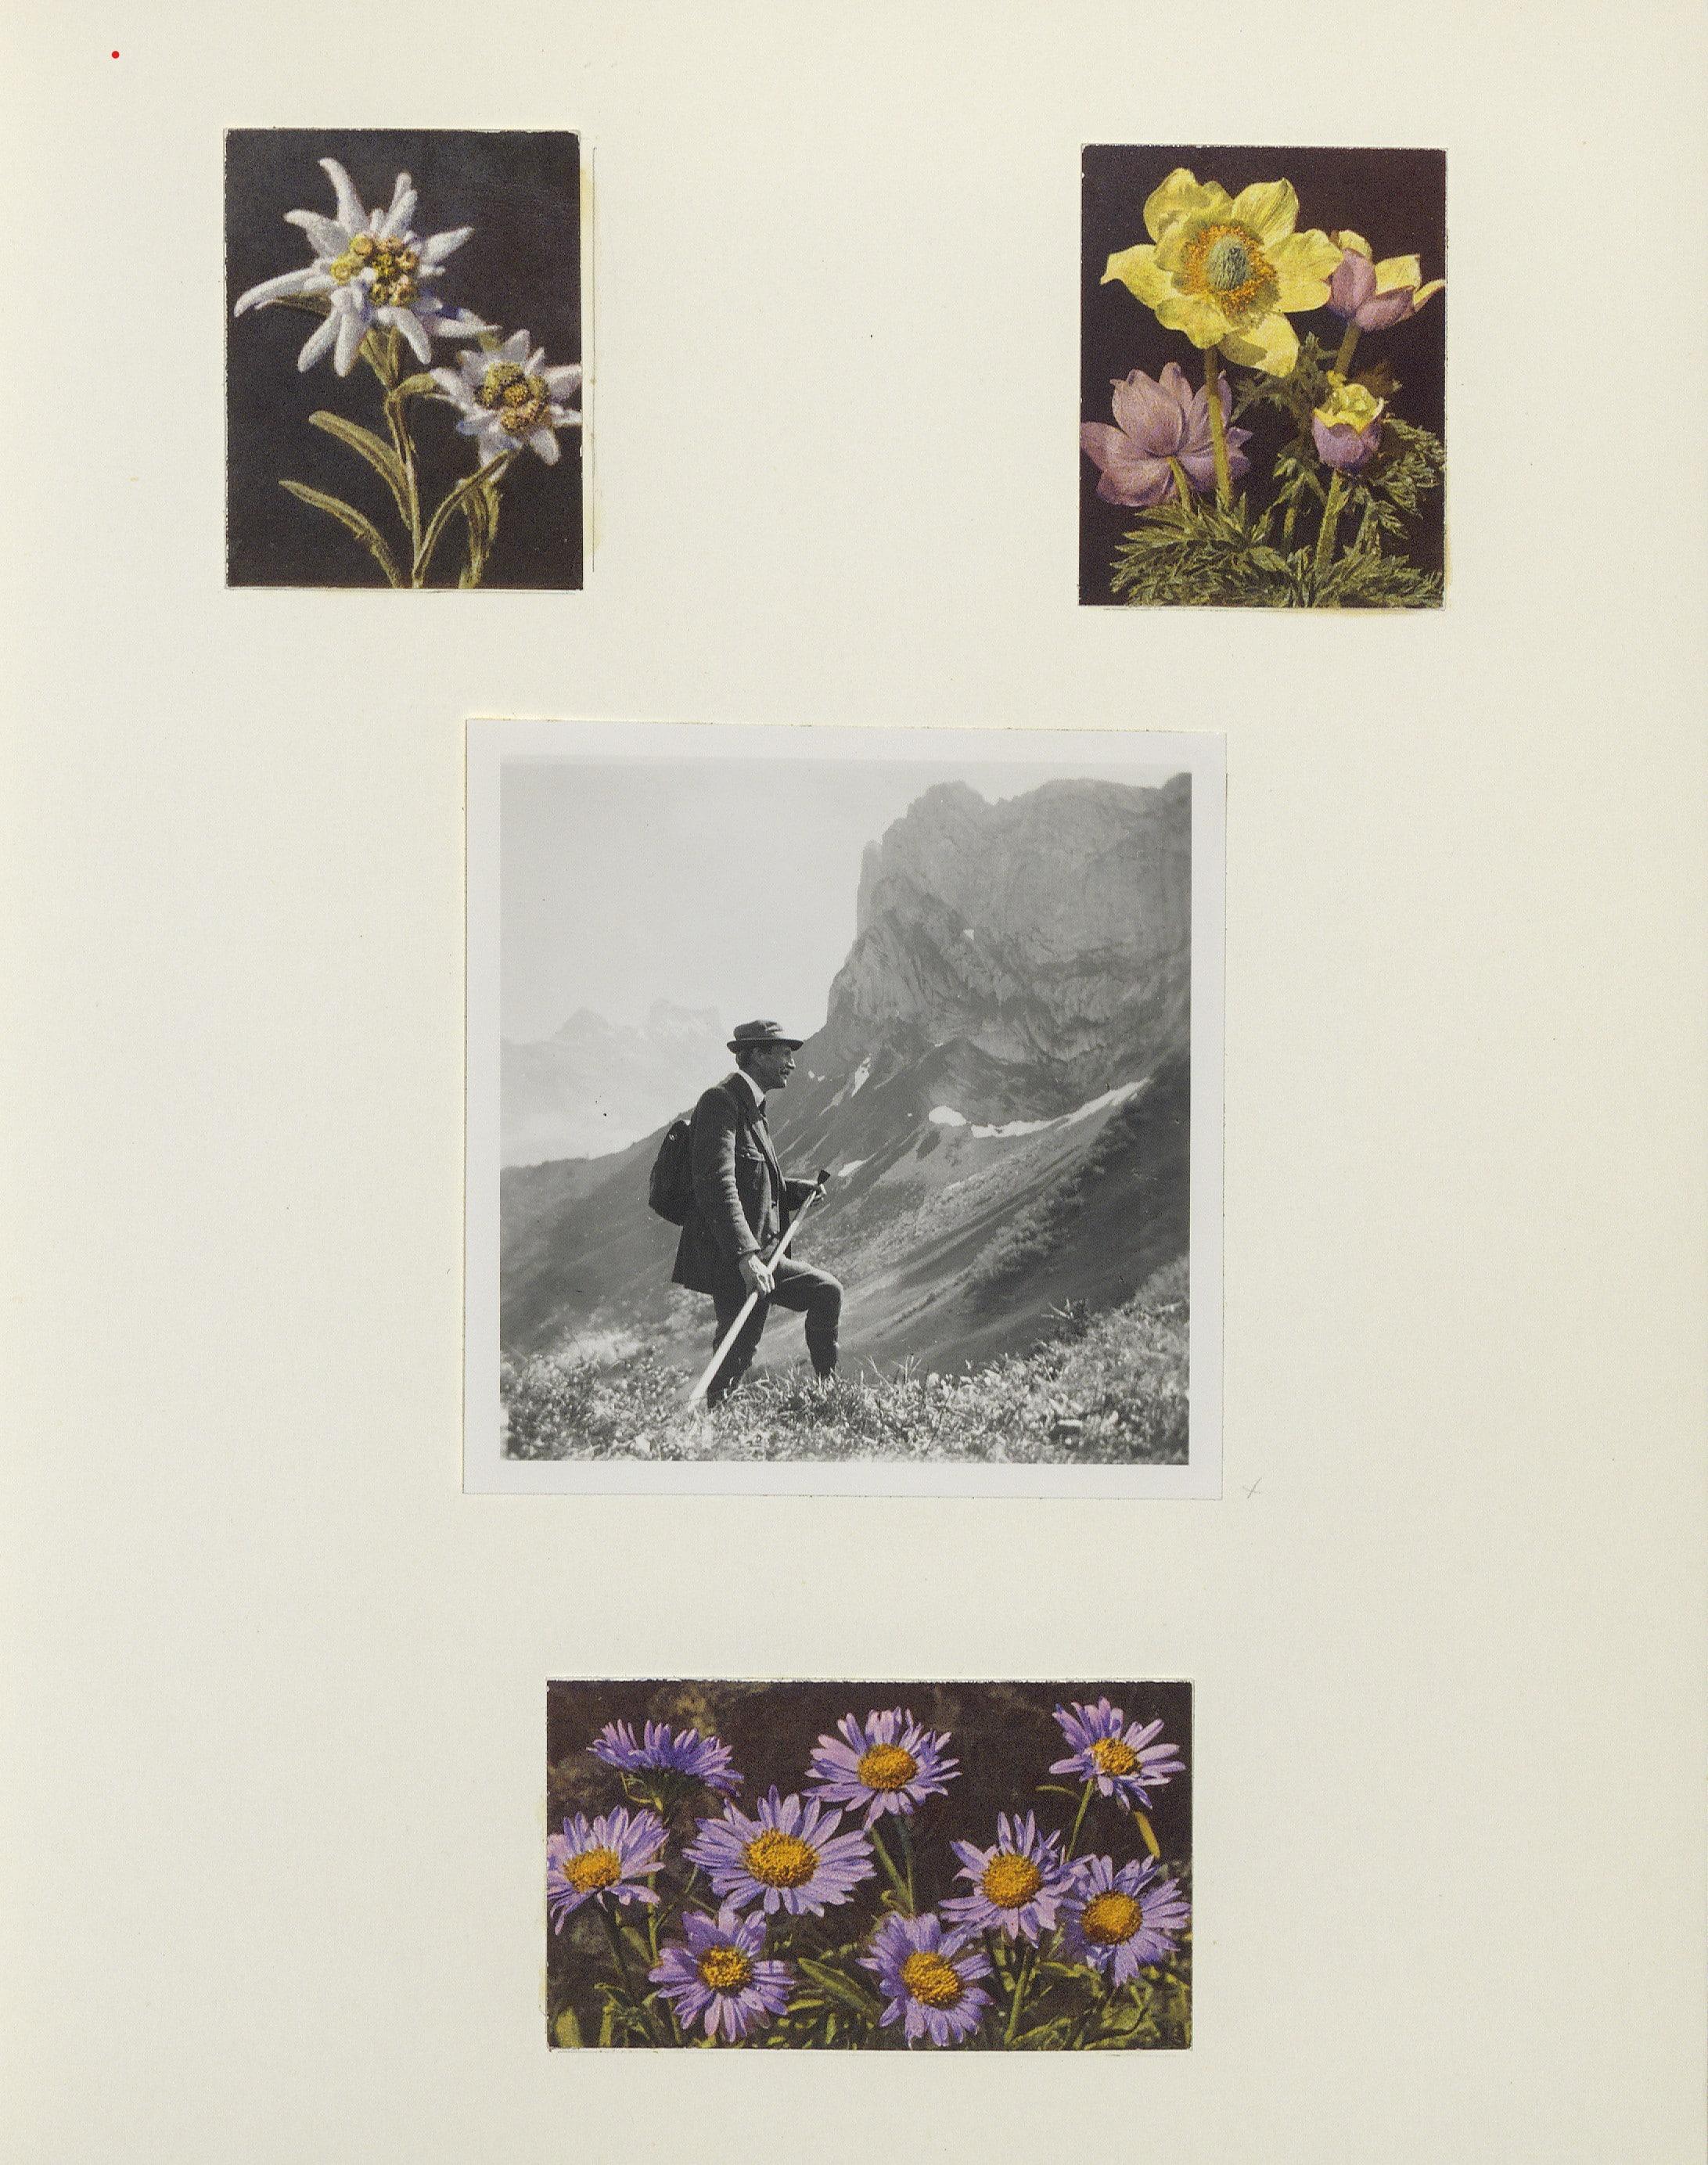 Album de photos privé de J. Lauber